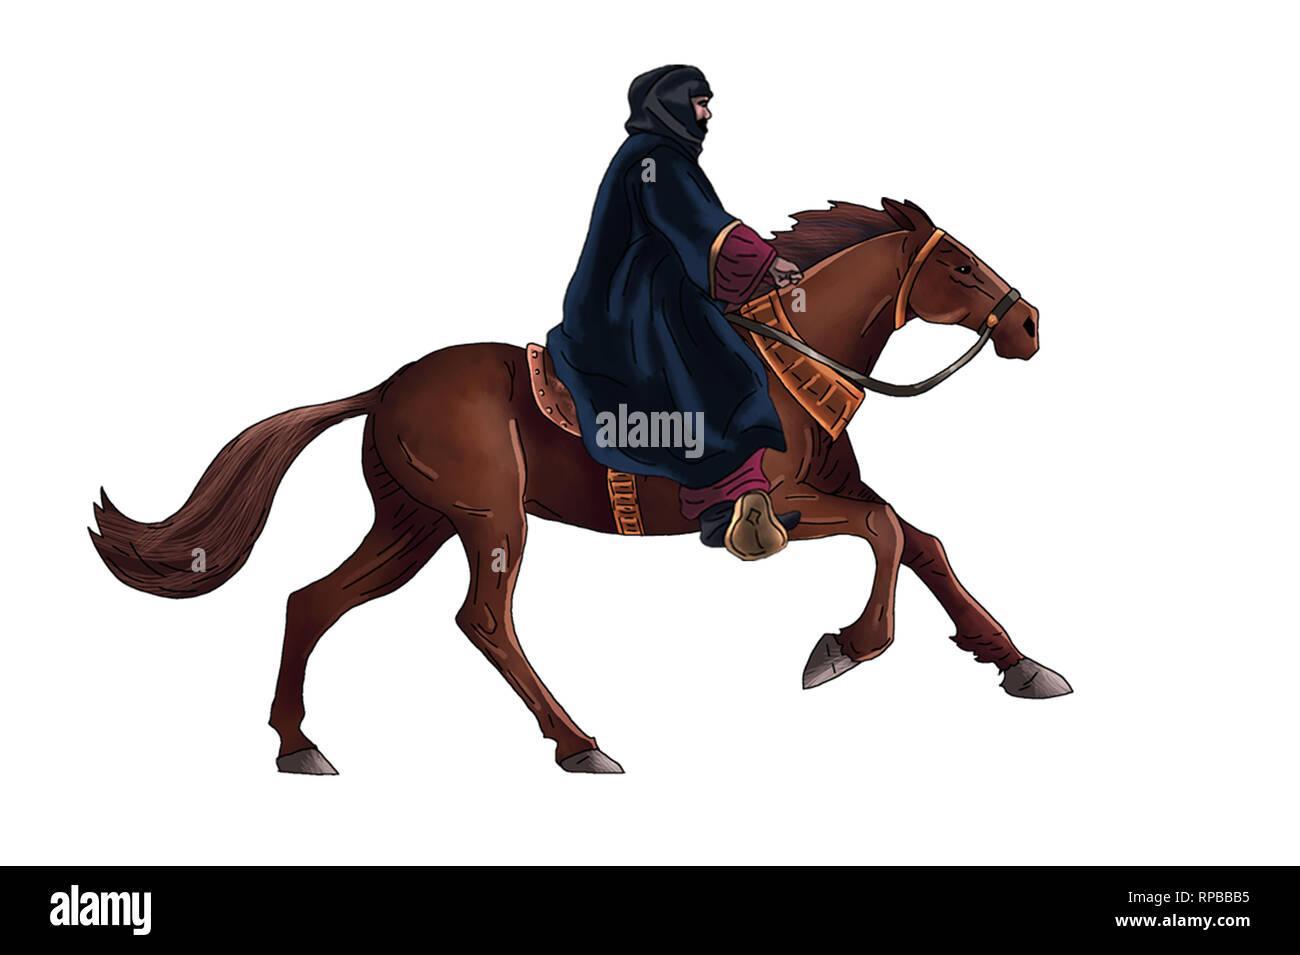 arab people - Stock Image